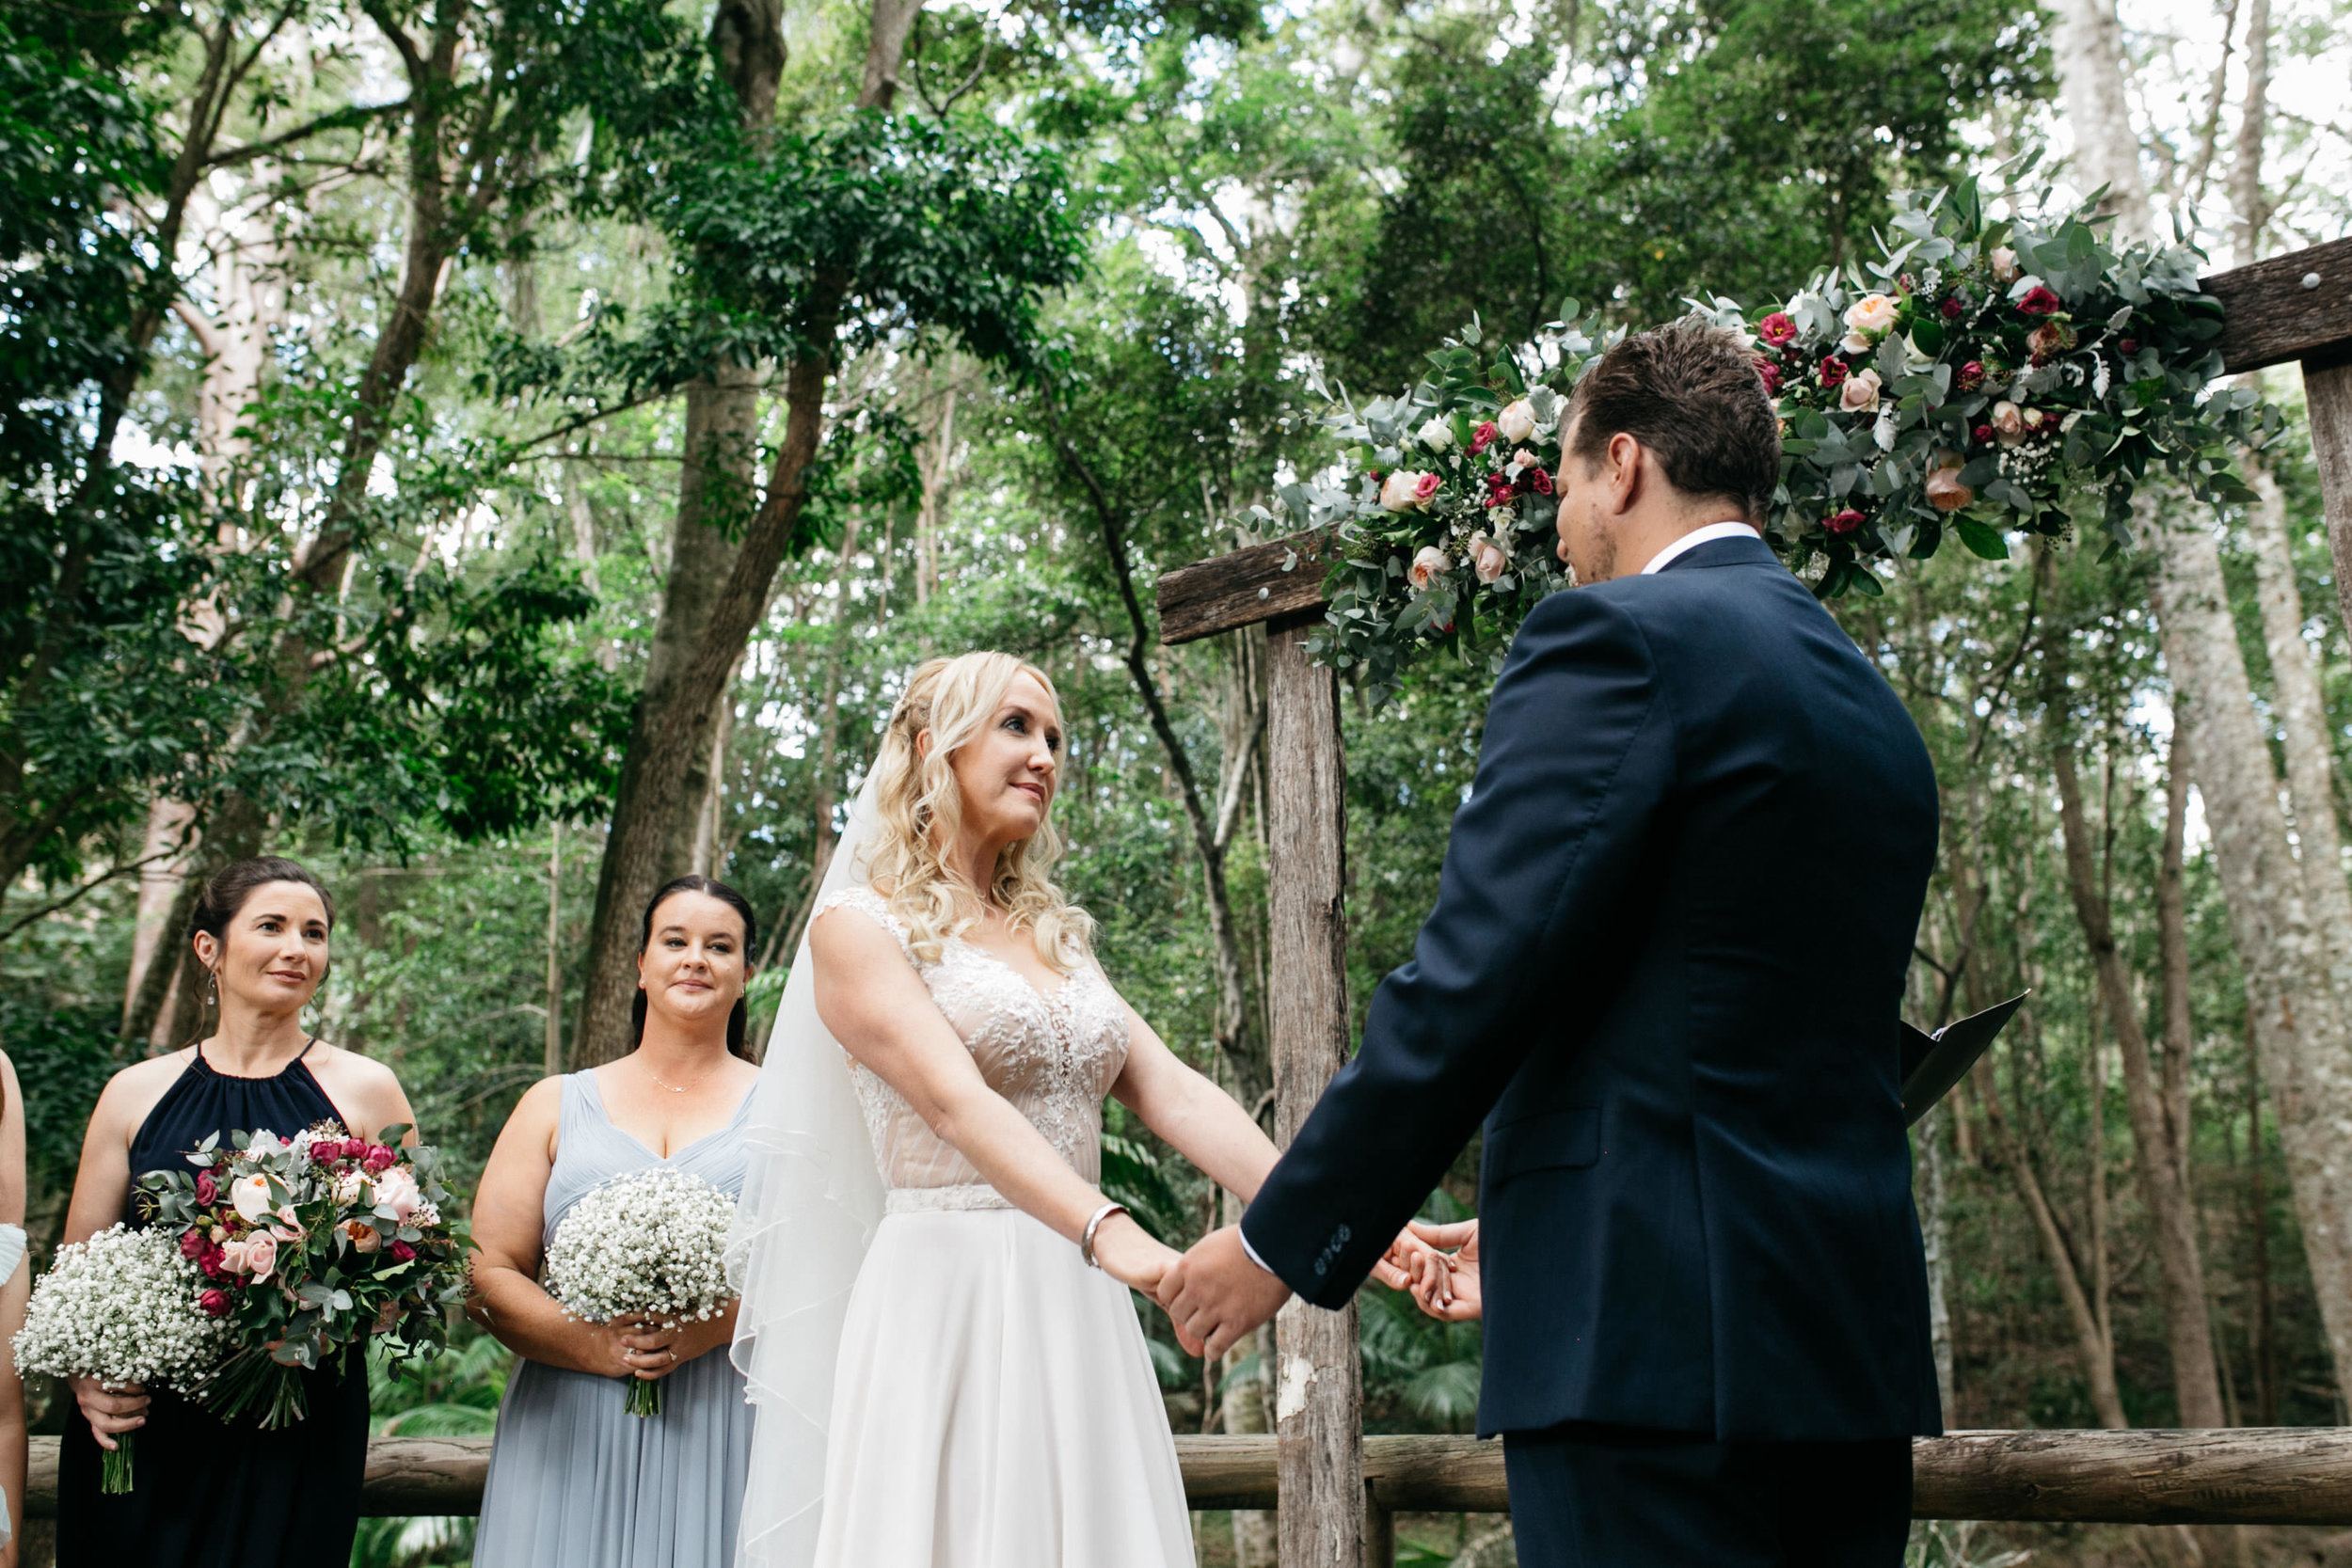 True North Photography_Boomerang Farm_Stacey and Isaac_Gold Coast Wedding_Barm Wedding_Hinterland Wedding-81.jpg